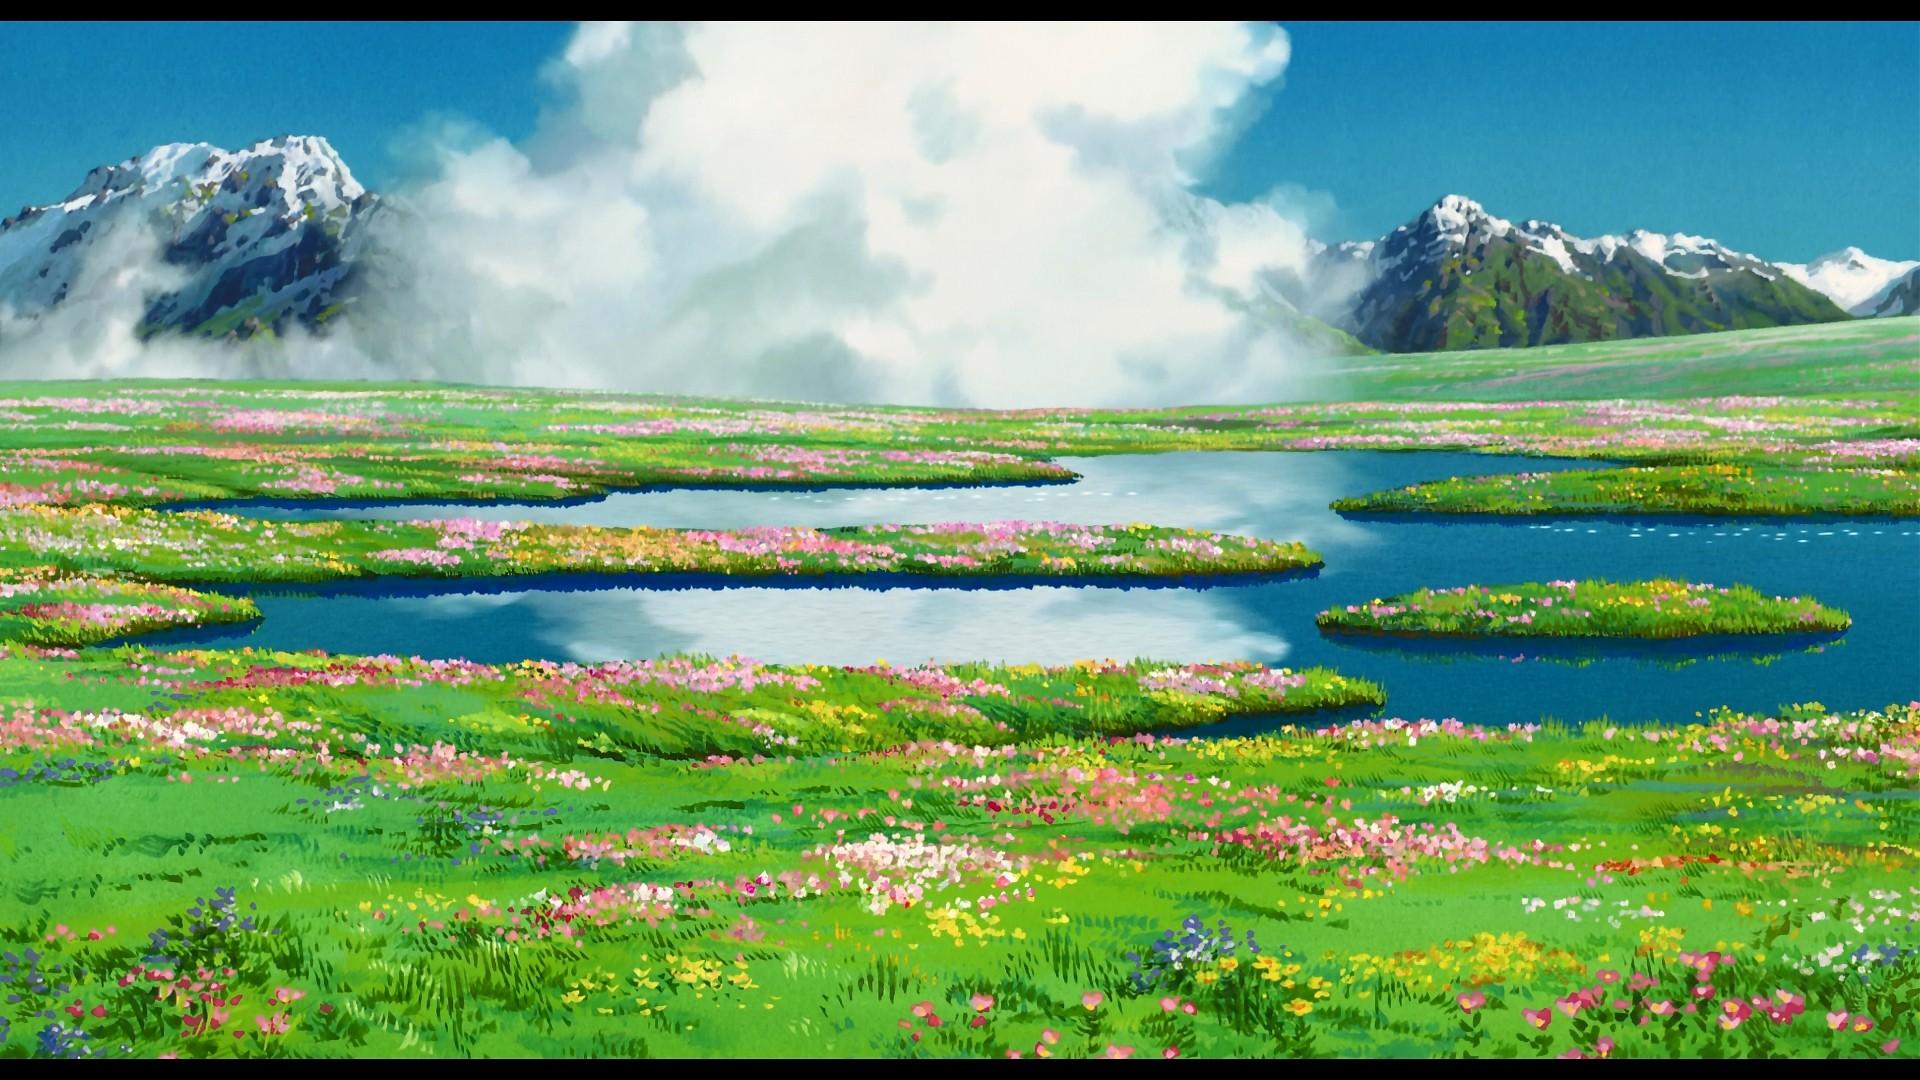 Ghibli Wallpaper for pc